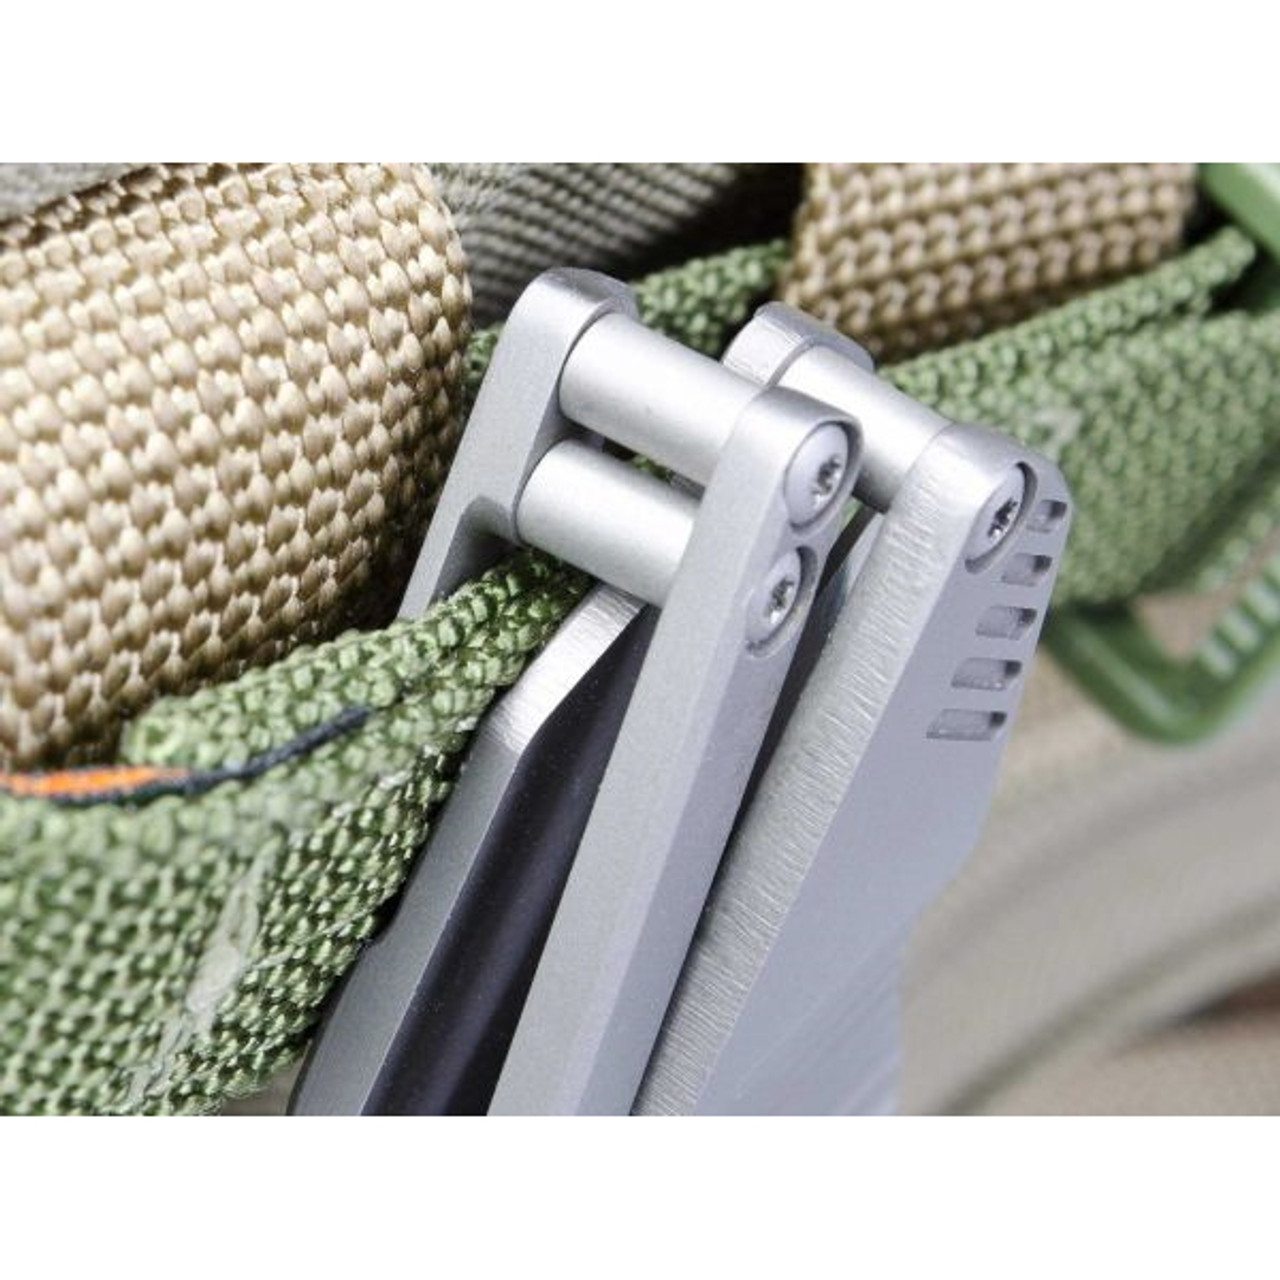 Boker Plus Federal Flipper Knife, Satin Blade POCKET CLIP VIEW